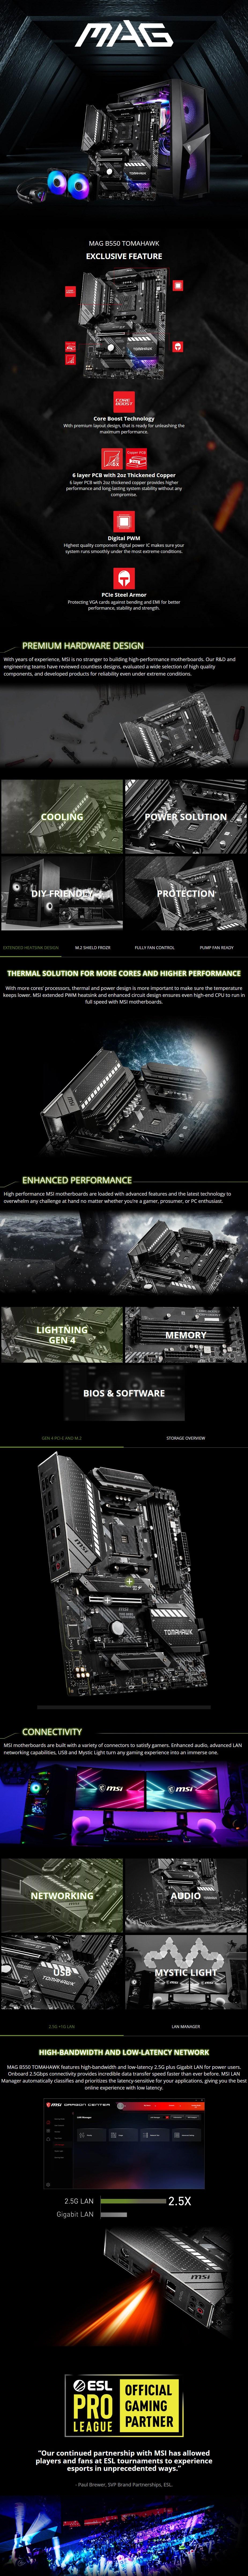 msi-mag-b550-tomahawk-am4-atx-motherboard-ac35539-10.jpg